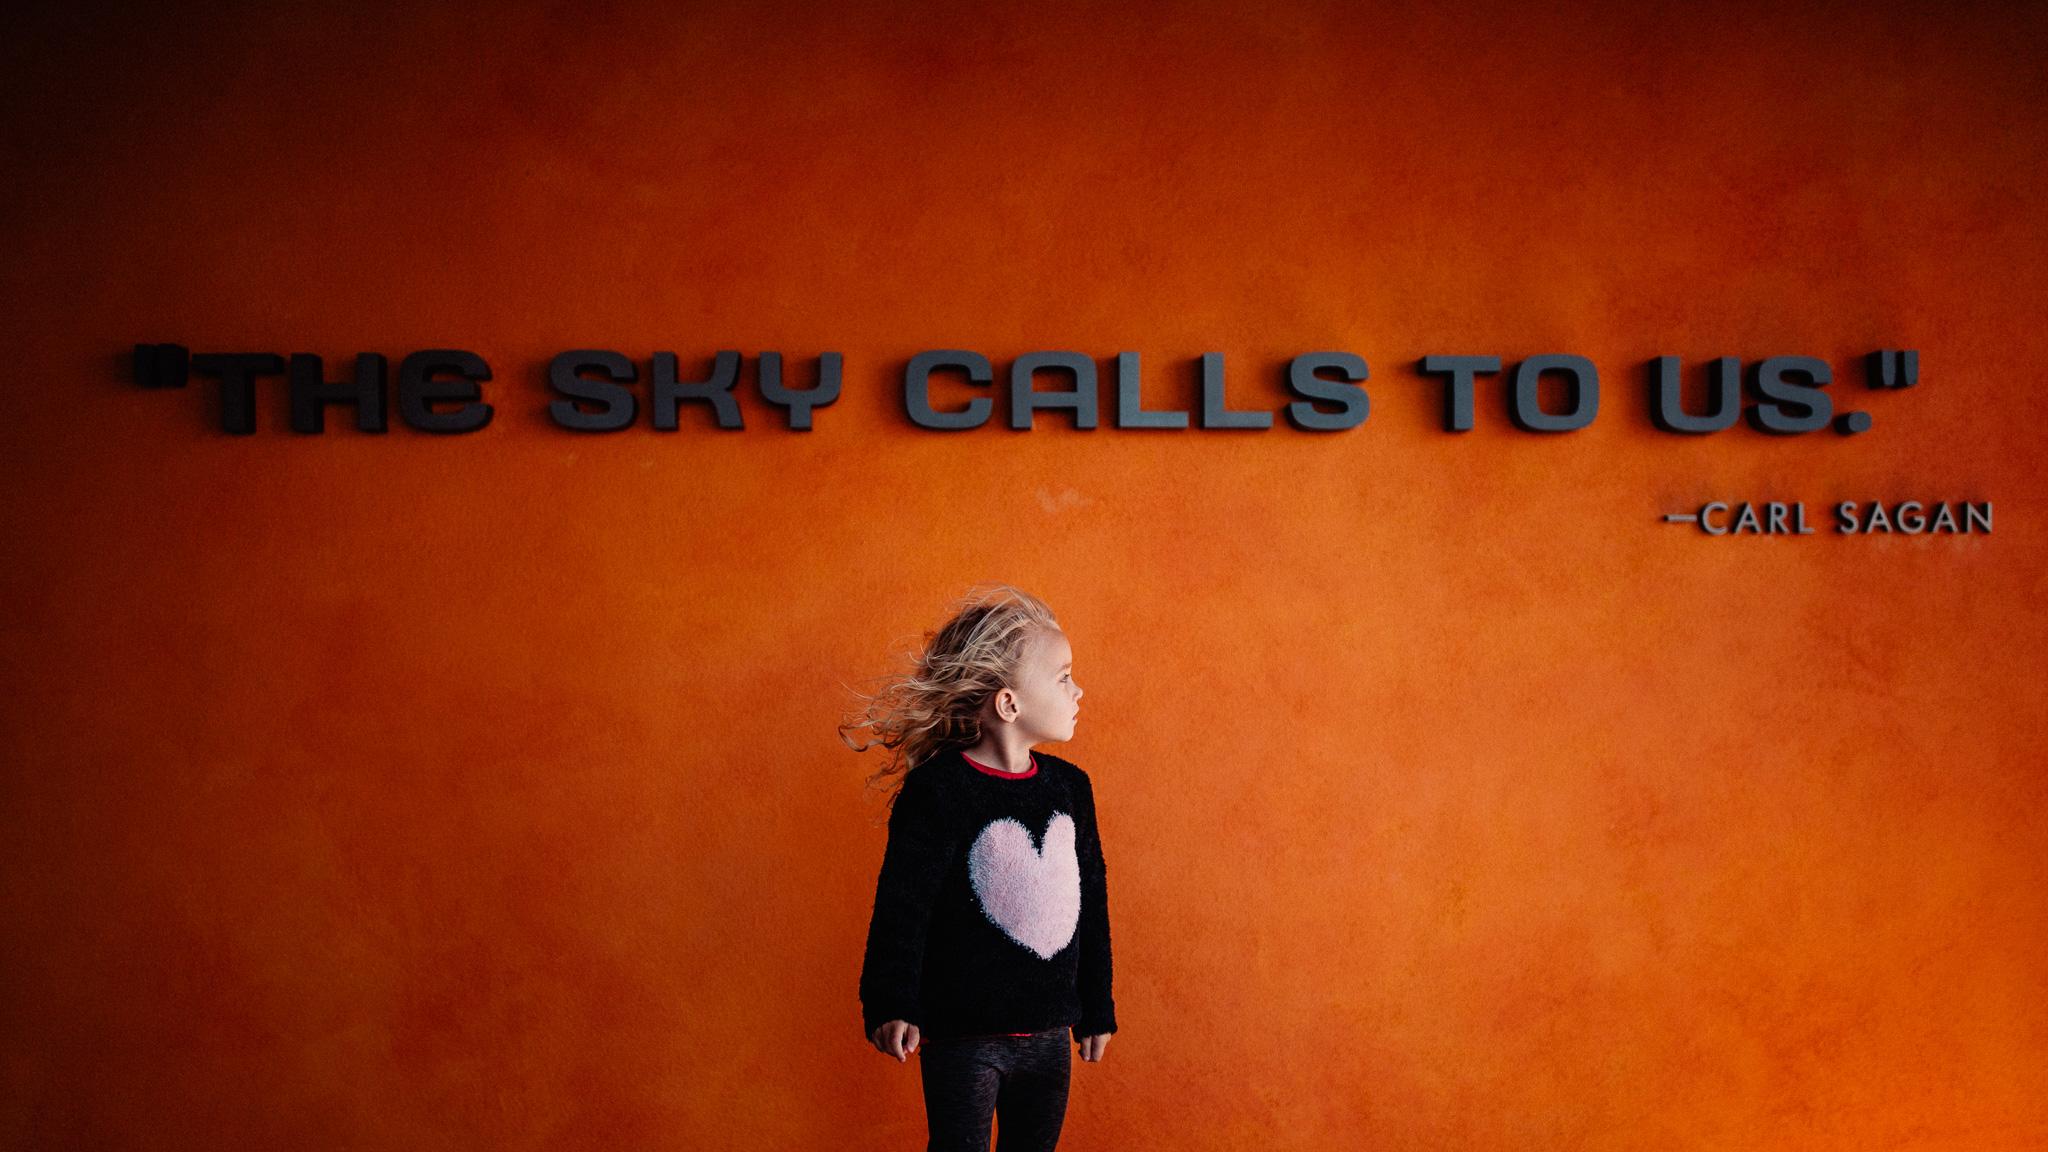 carl sagan quote the sky calls to us